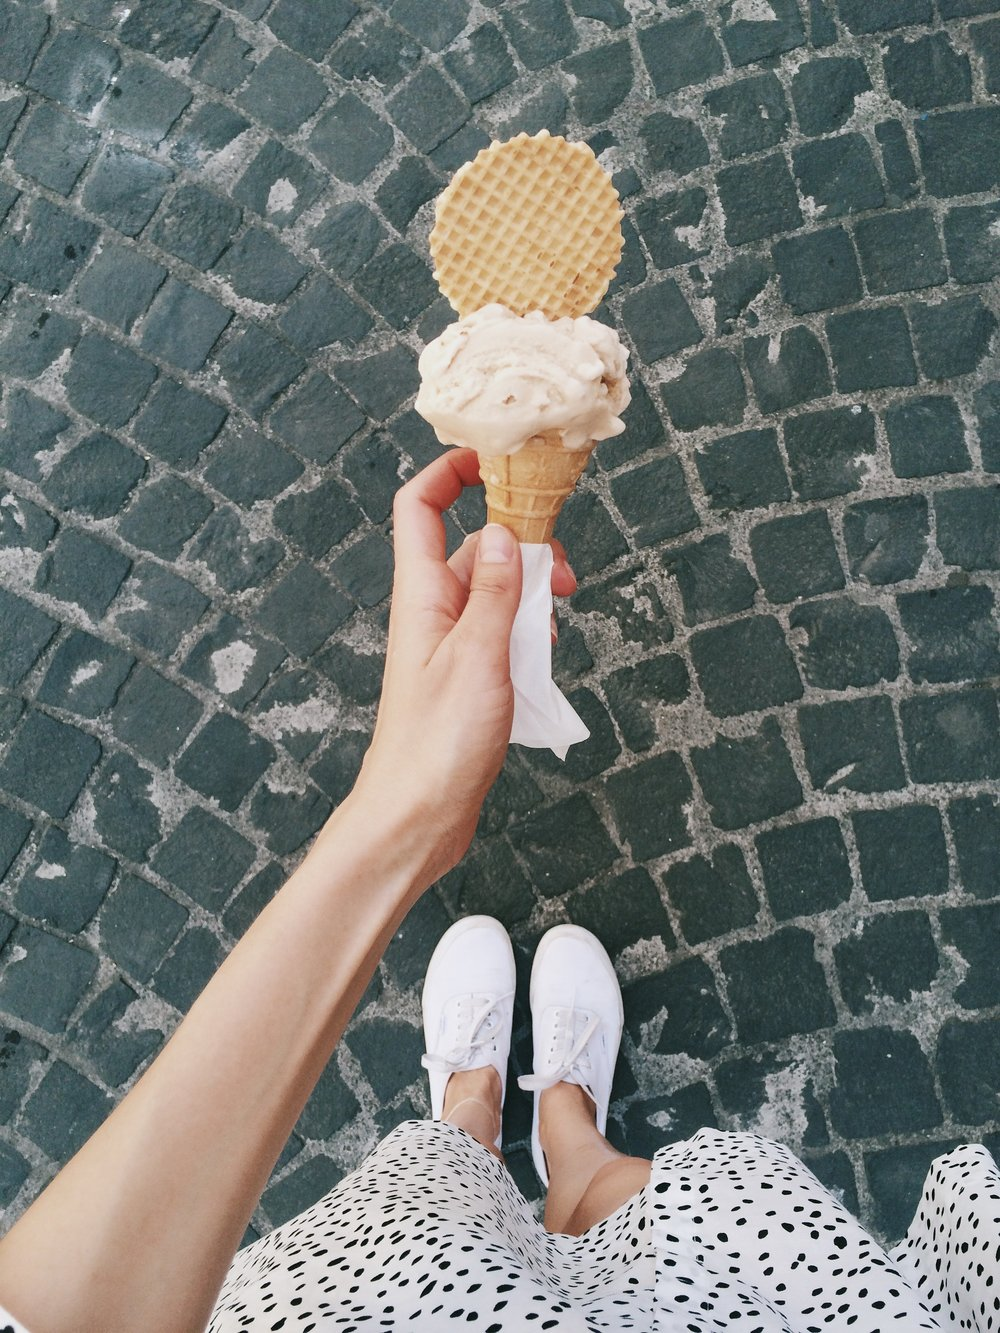 negative-space-woman-eating-ice-cream-walking-summer-daria-shevtsova.jpg